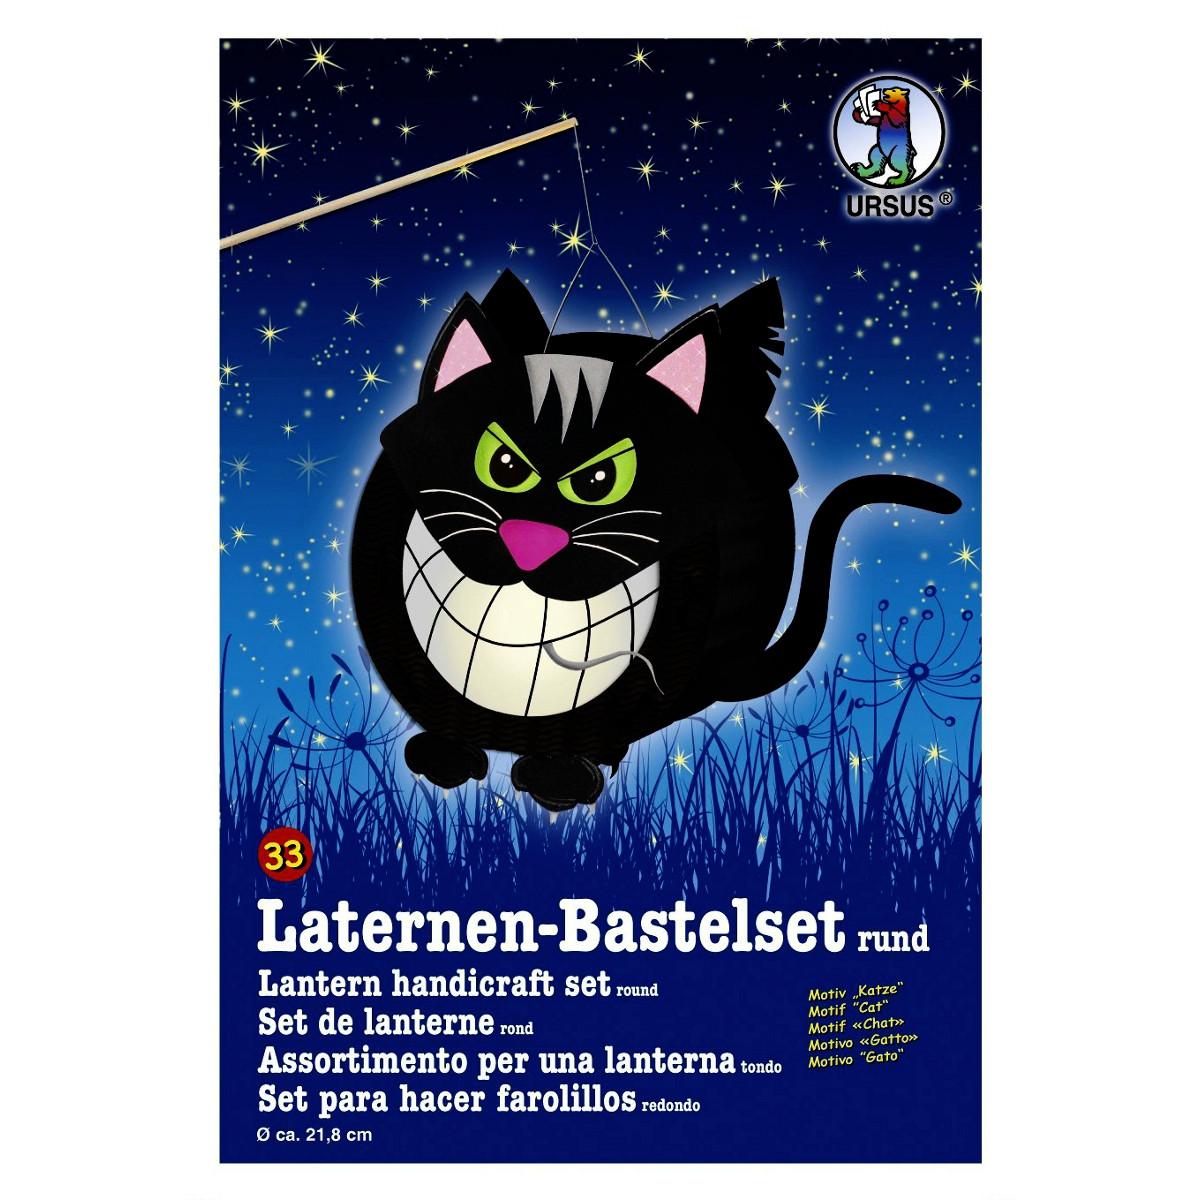 Laternen-Bastelset \